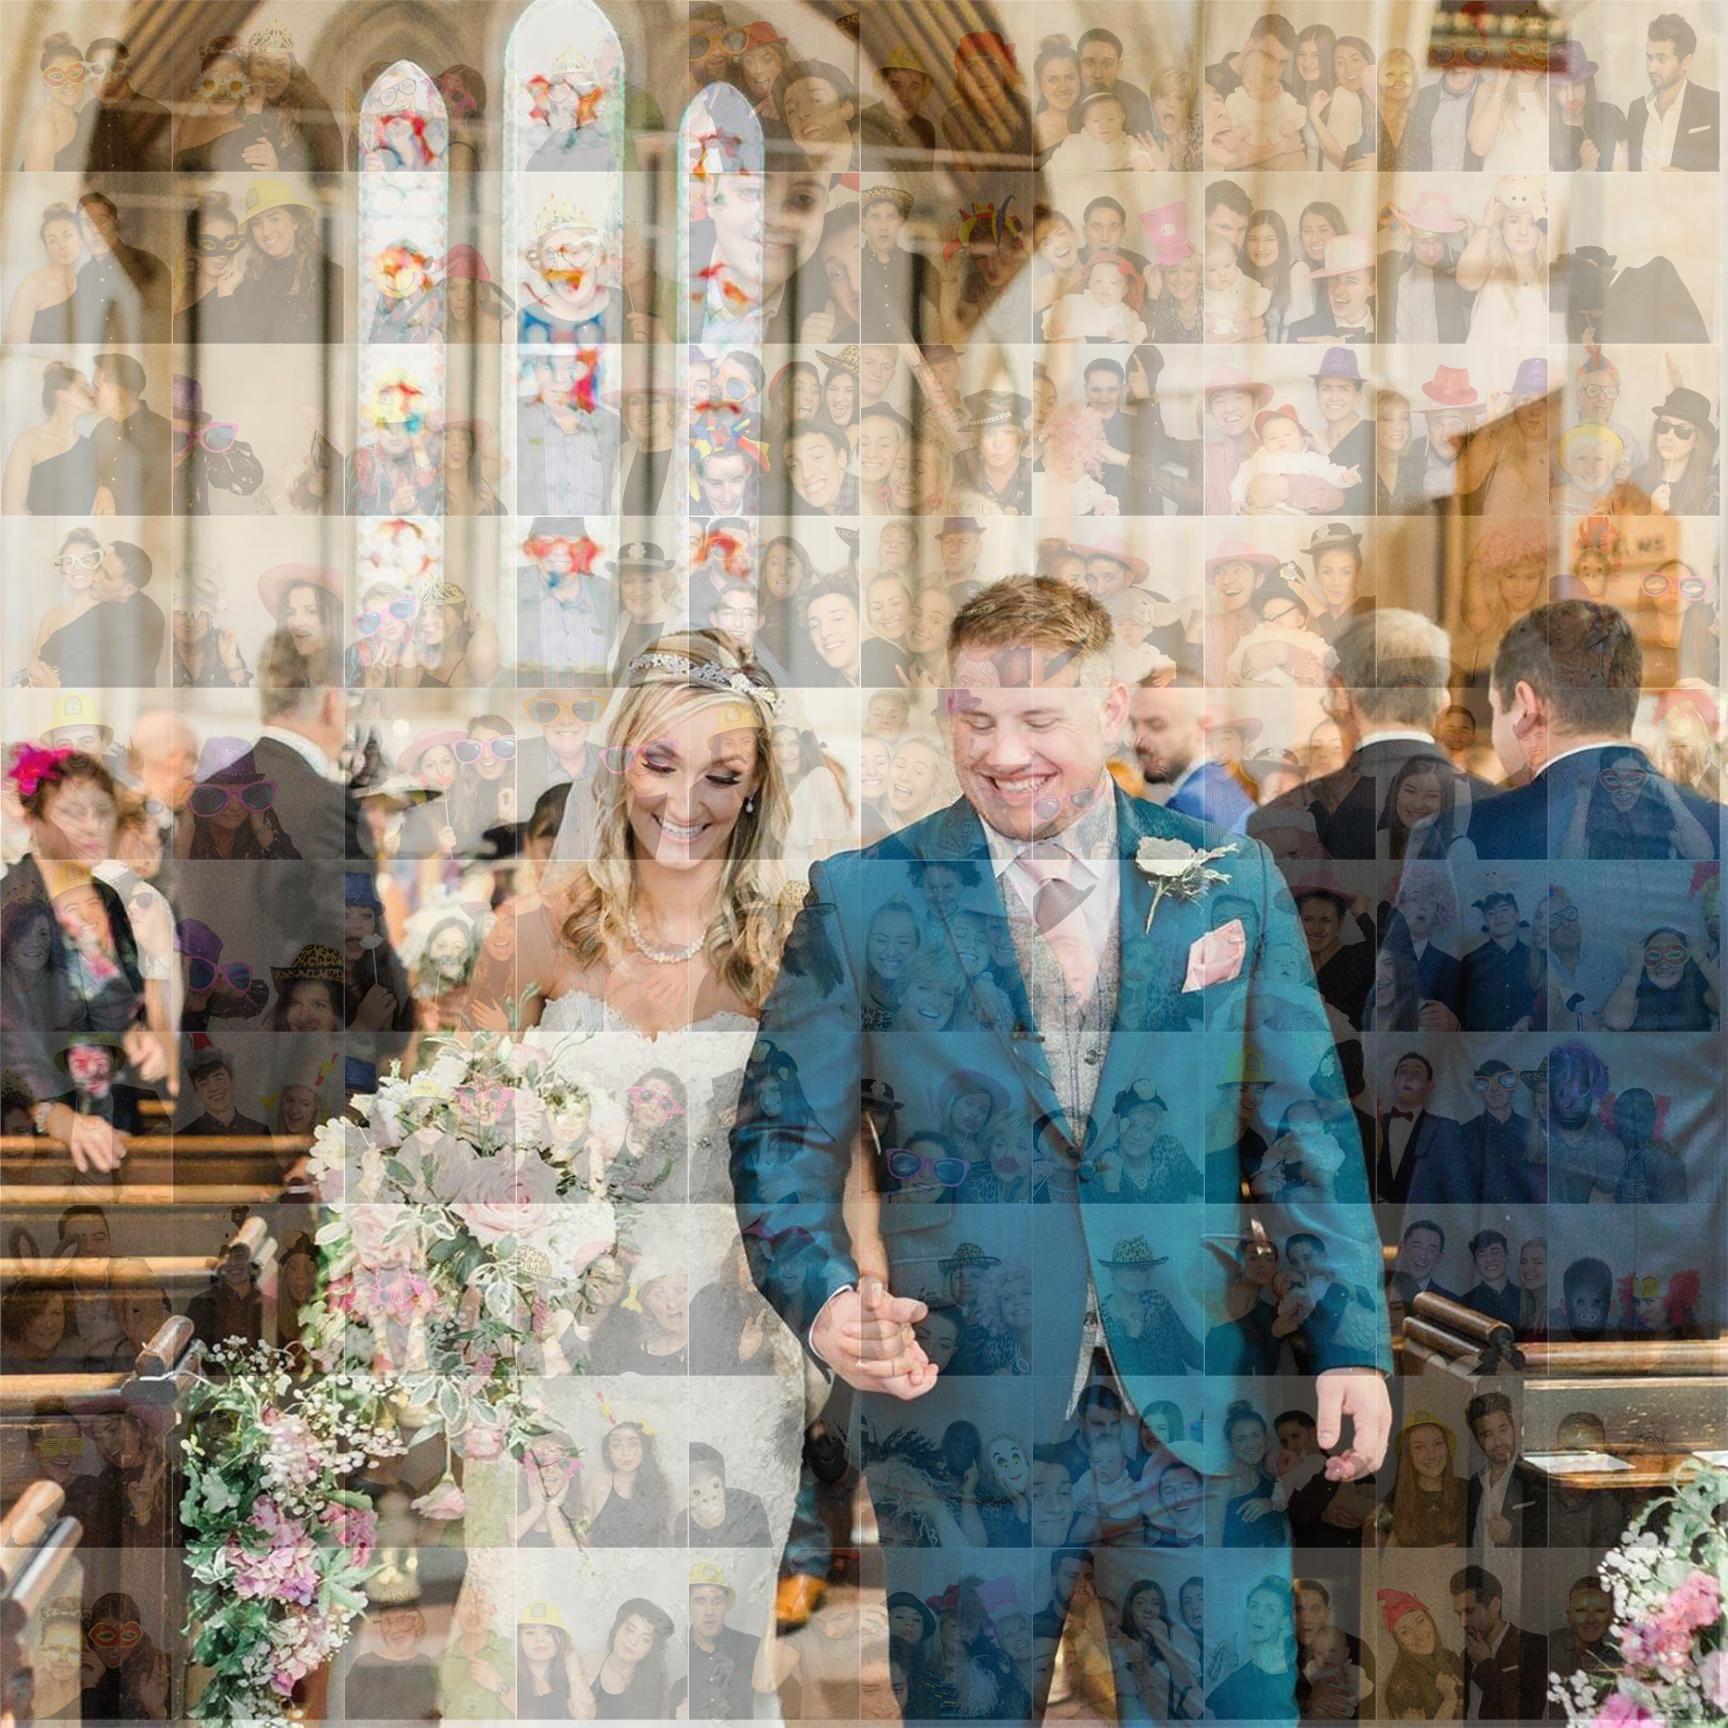 wedding photo mosaic wall